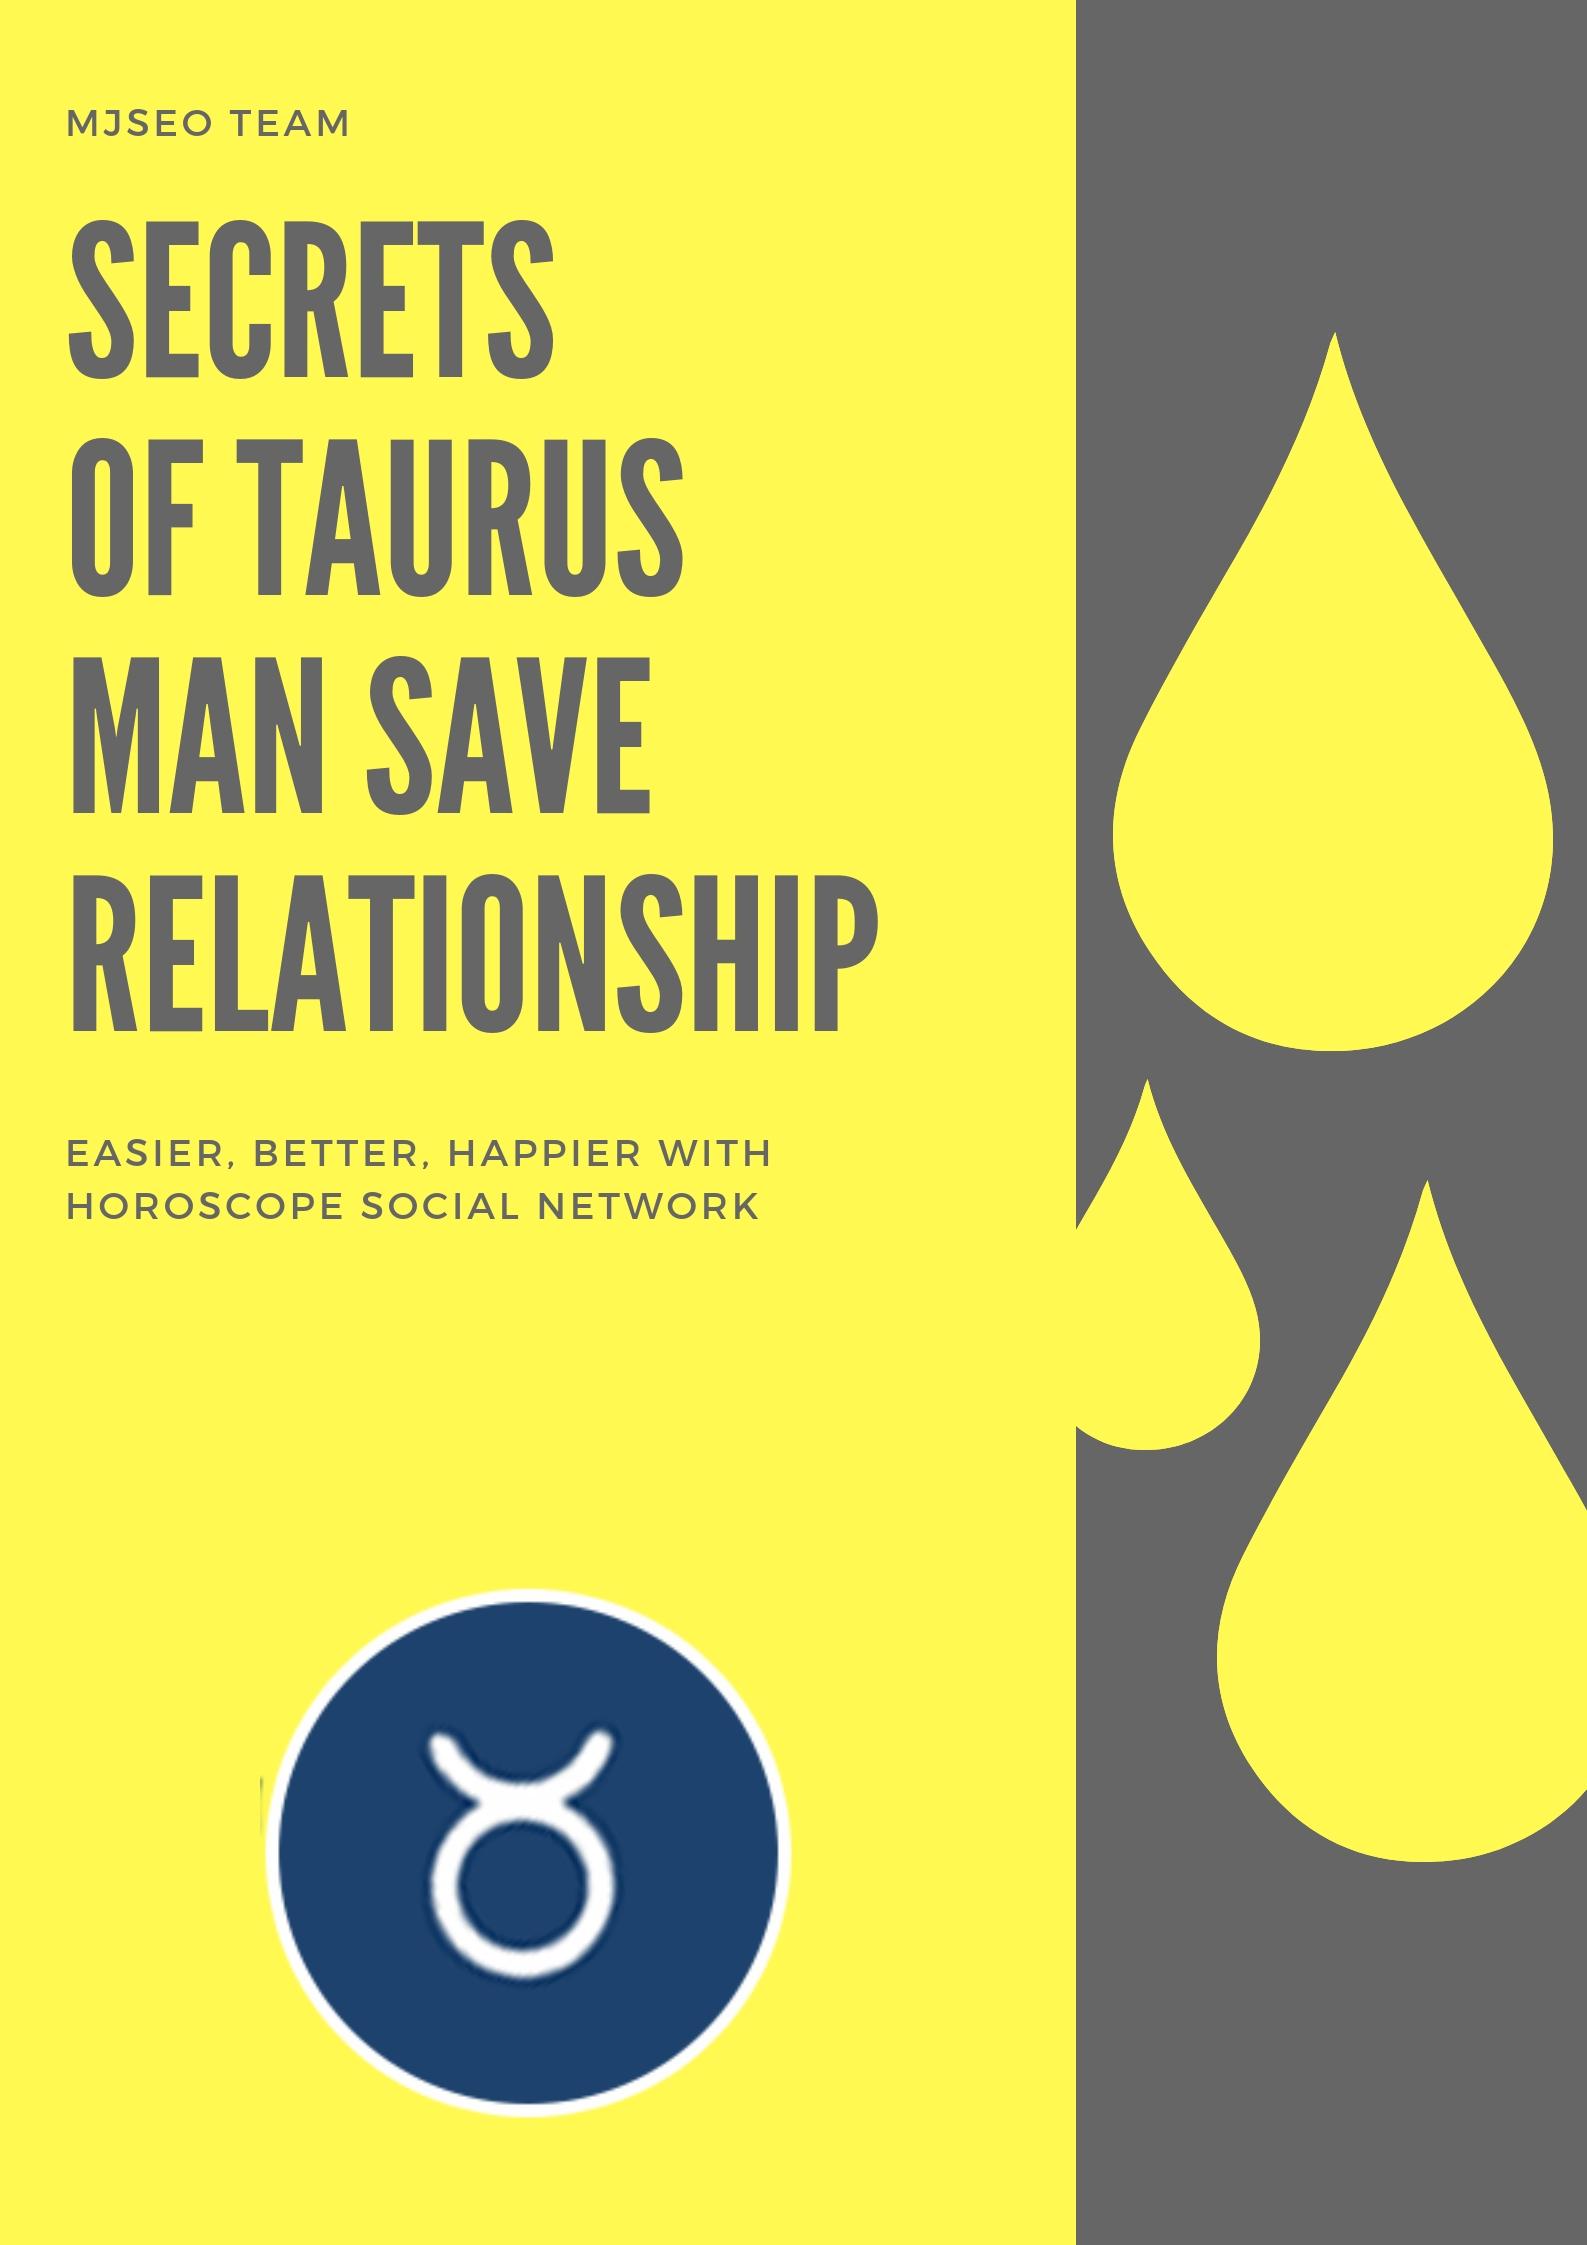 Secrets-Of-Taurus-Man-Save-Relationship